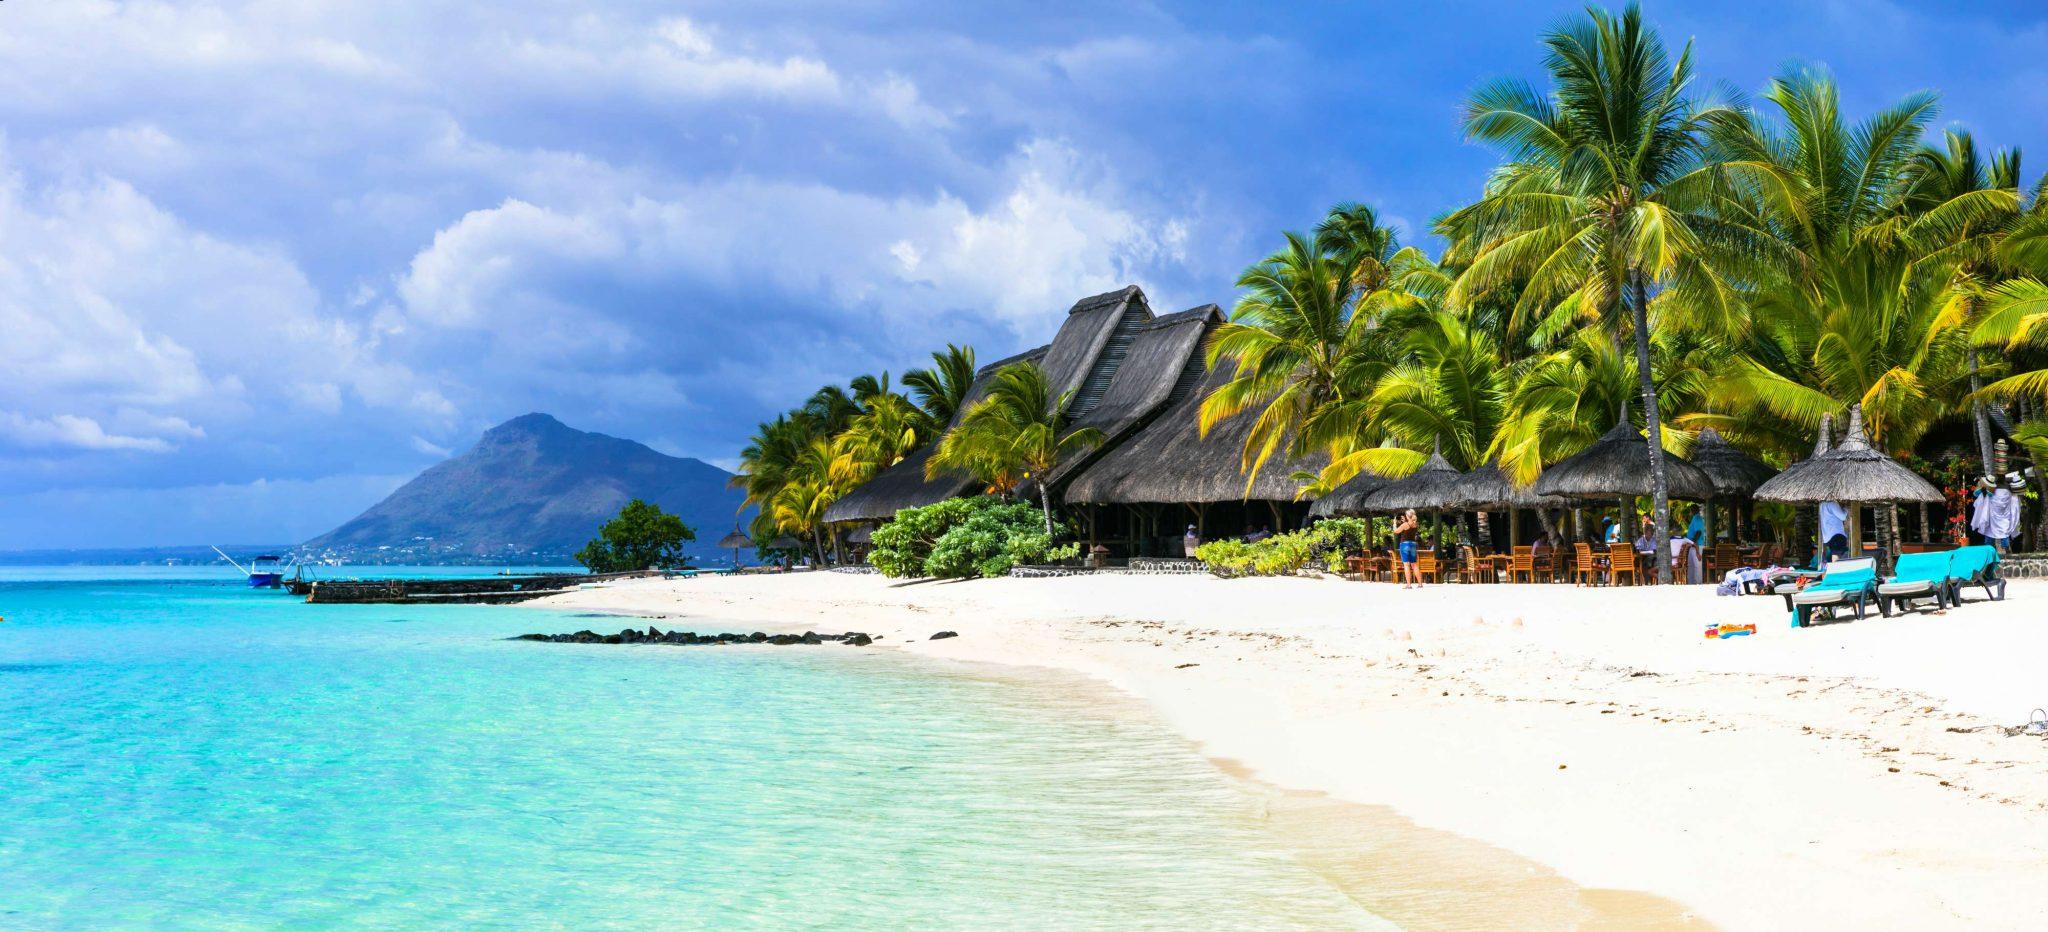 Mauritius 1 - 65. Nočni pohod na Slivnico